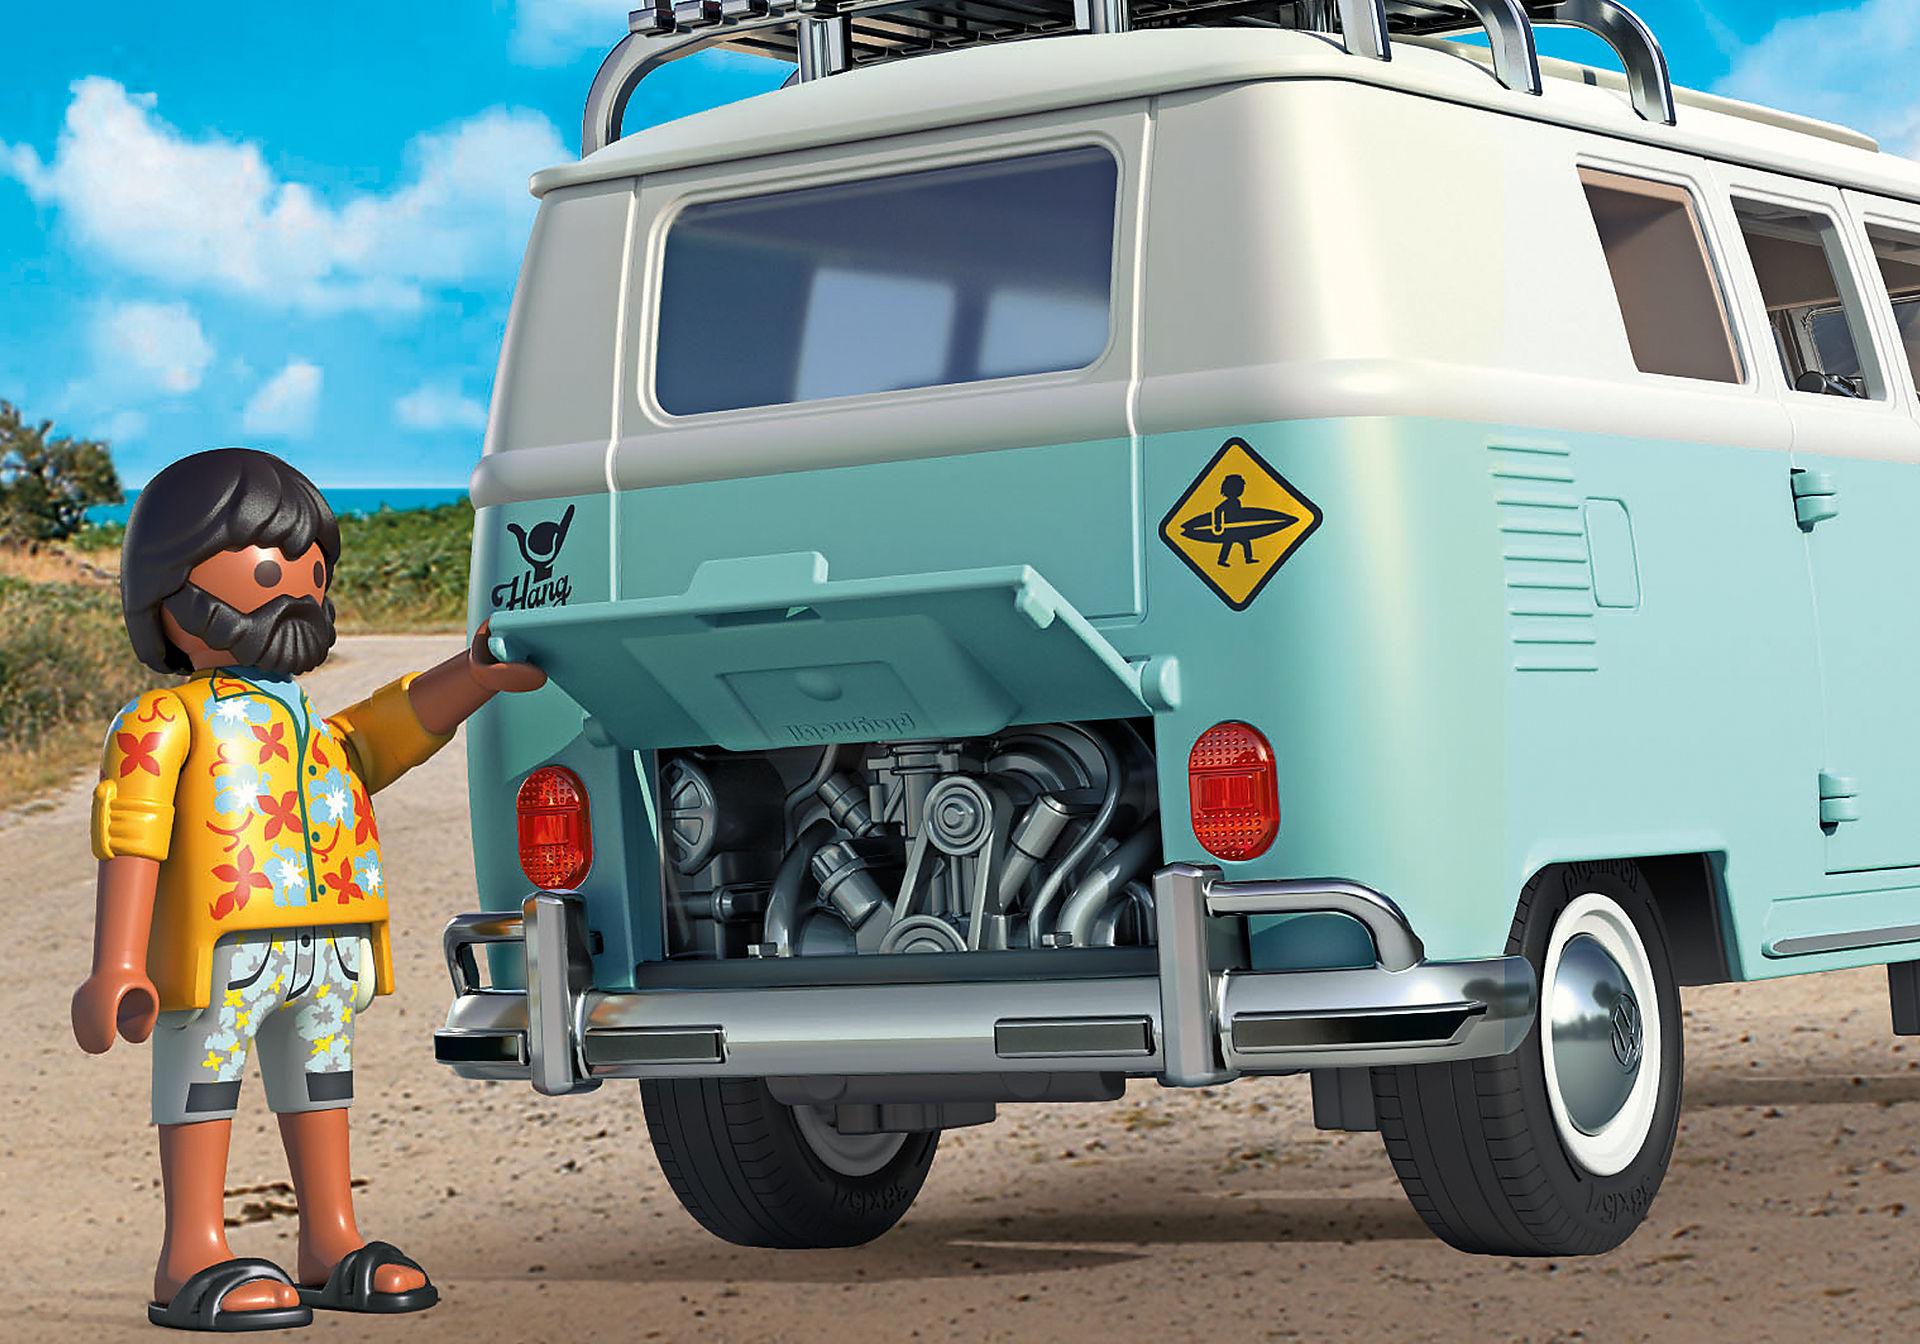 70826 Volkswagen T1 Campingbus - Special Edition zoom image9